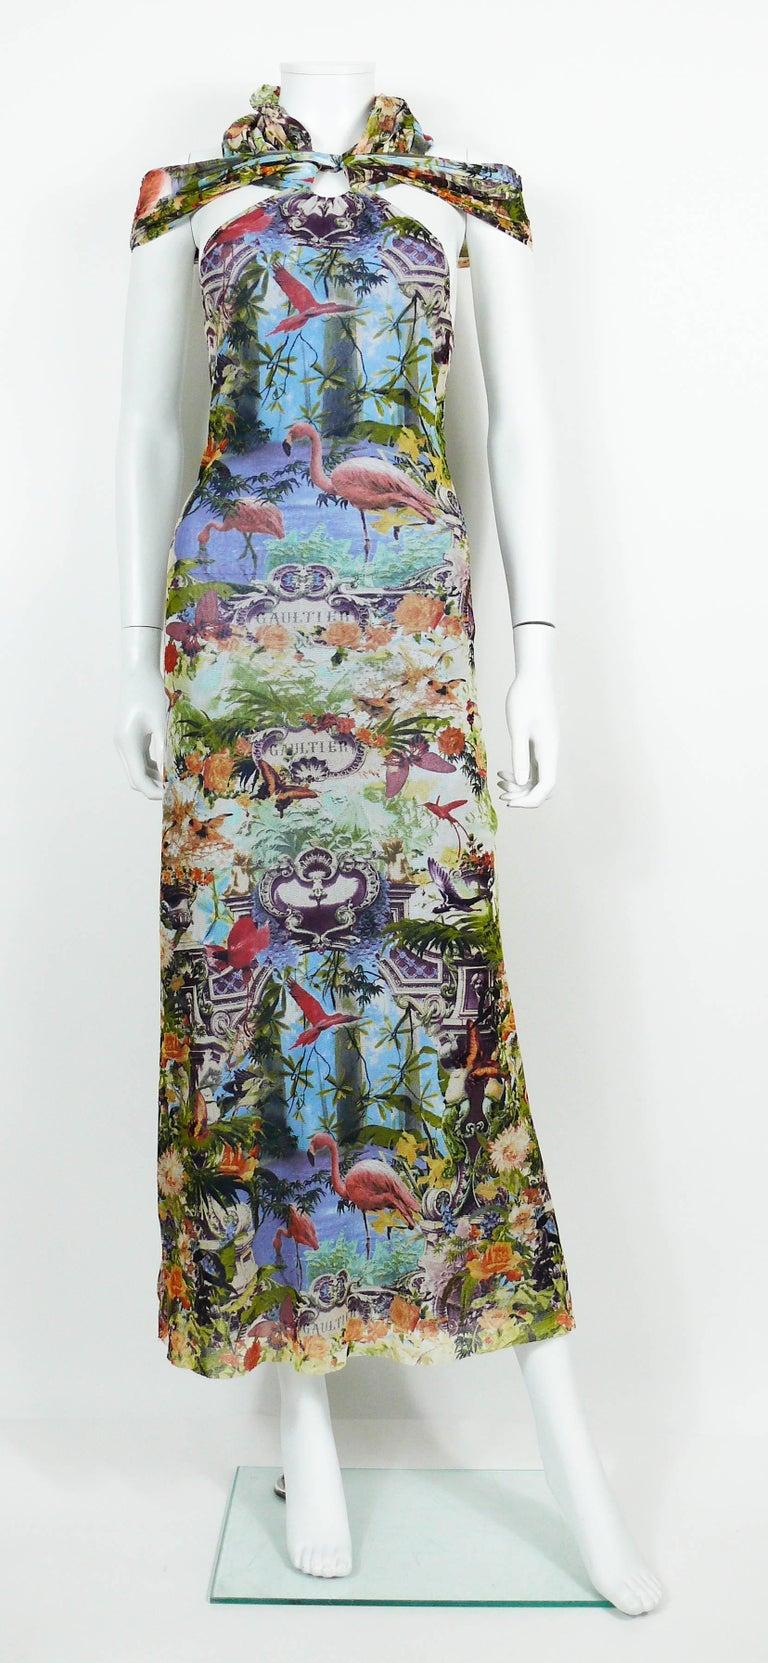 Blue Jean Paul Gaultier Vintage Tropical Print Sheer Halter Dress For Sale 84f8c36a0